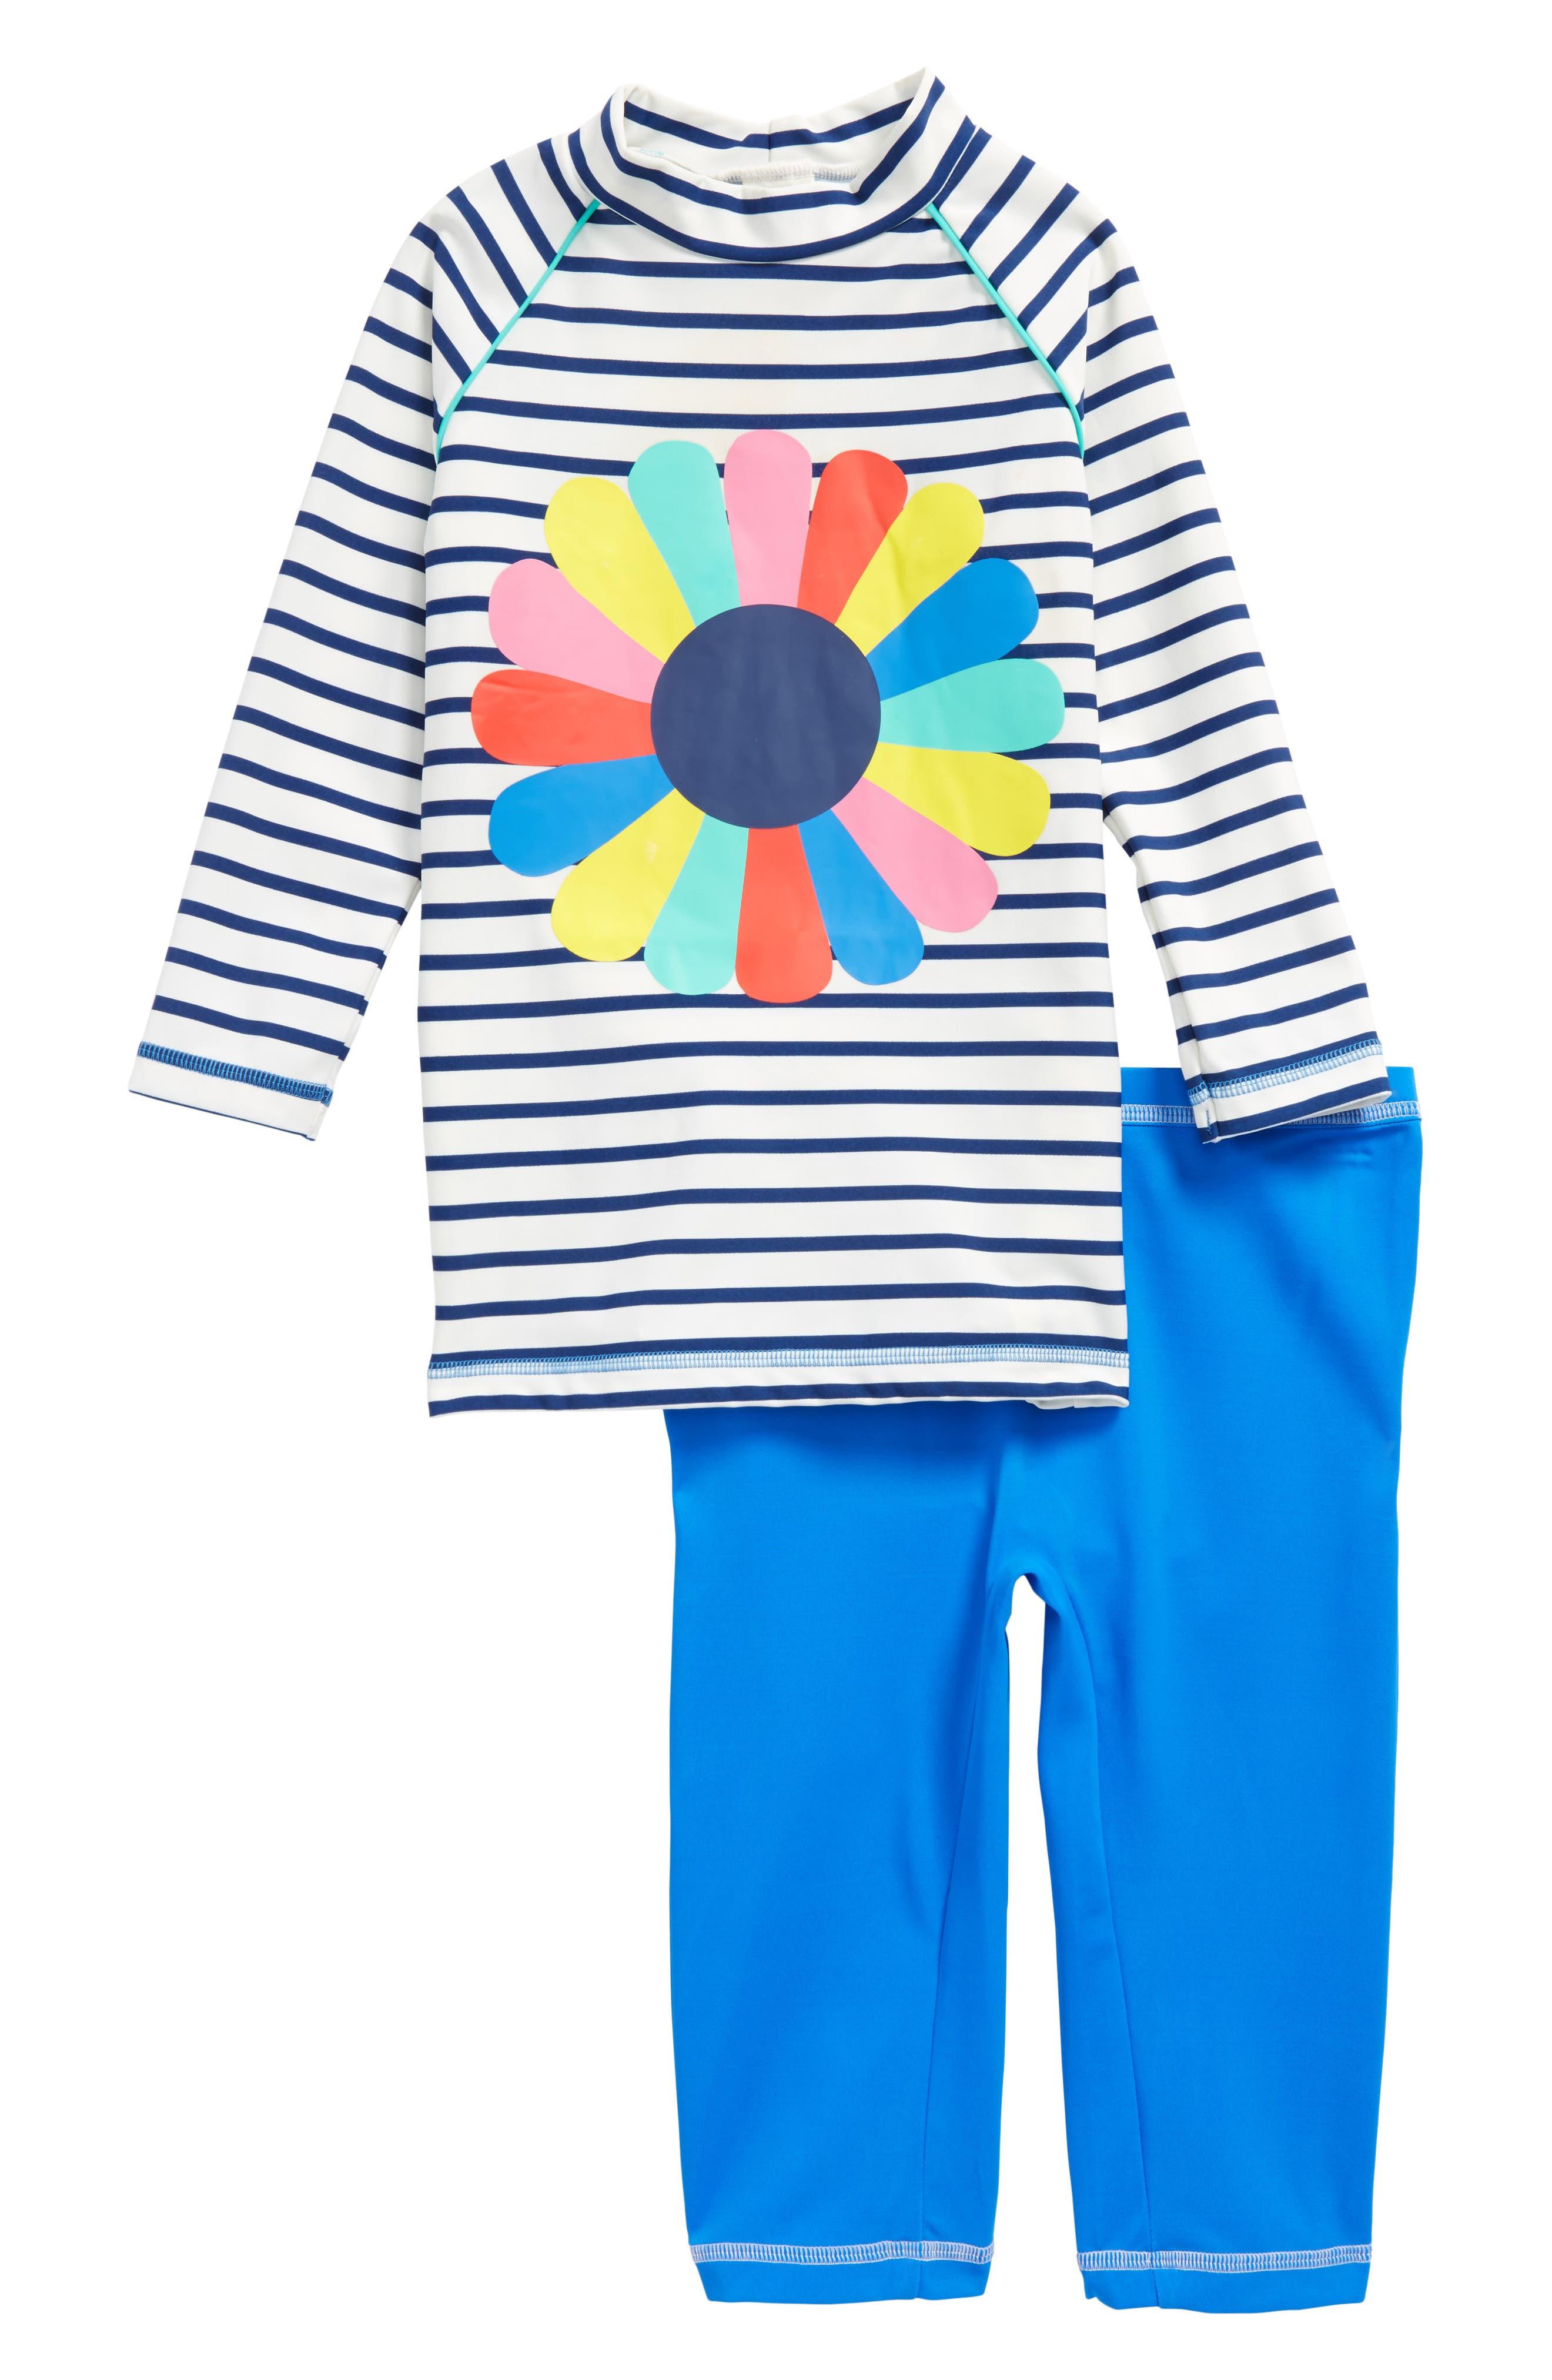 Sea Explorer Two-Piece Rashguard Swimsuit,                         Main,                         color, Ivory/ Deep Sea Blue/ Flower